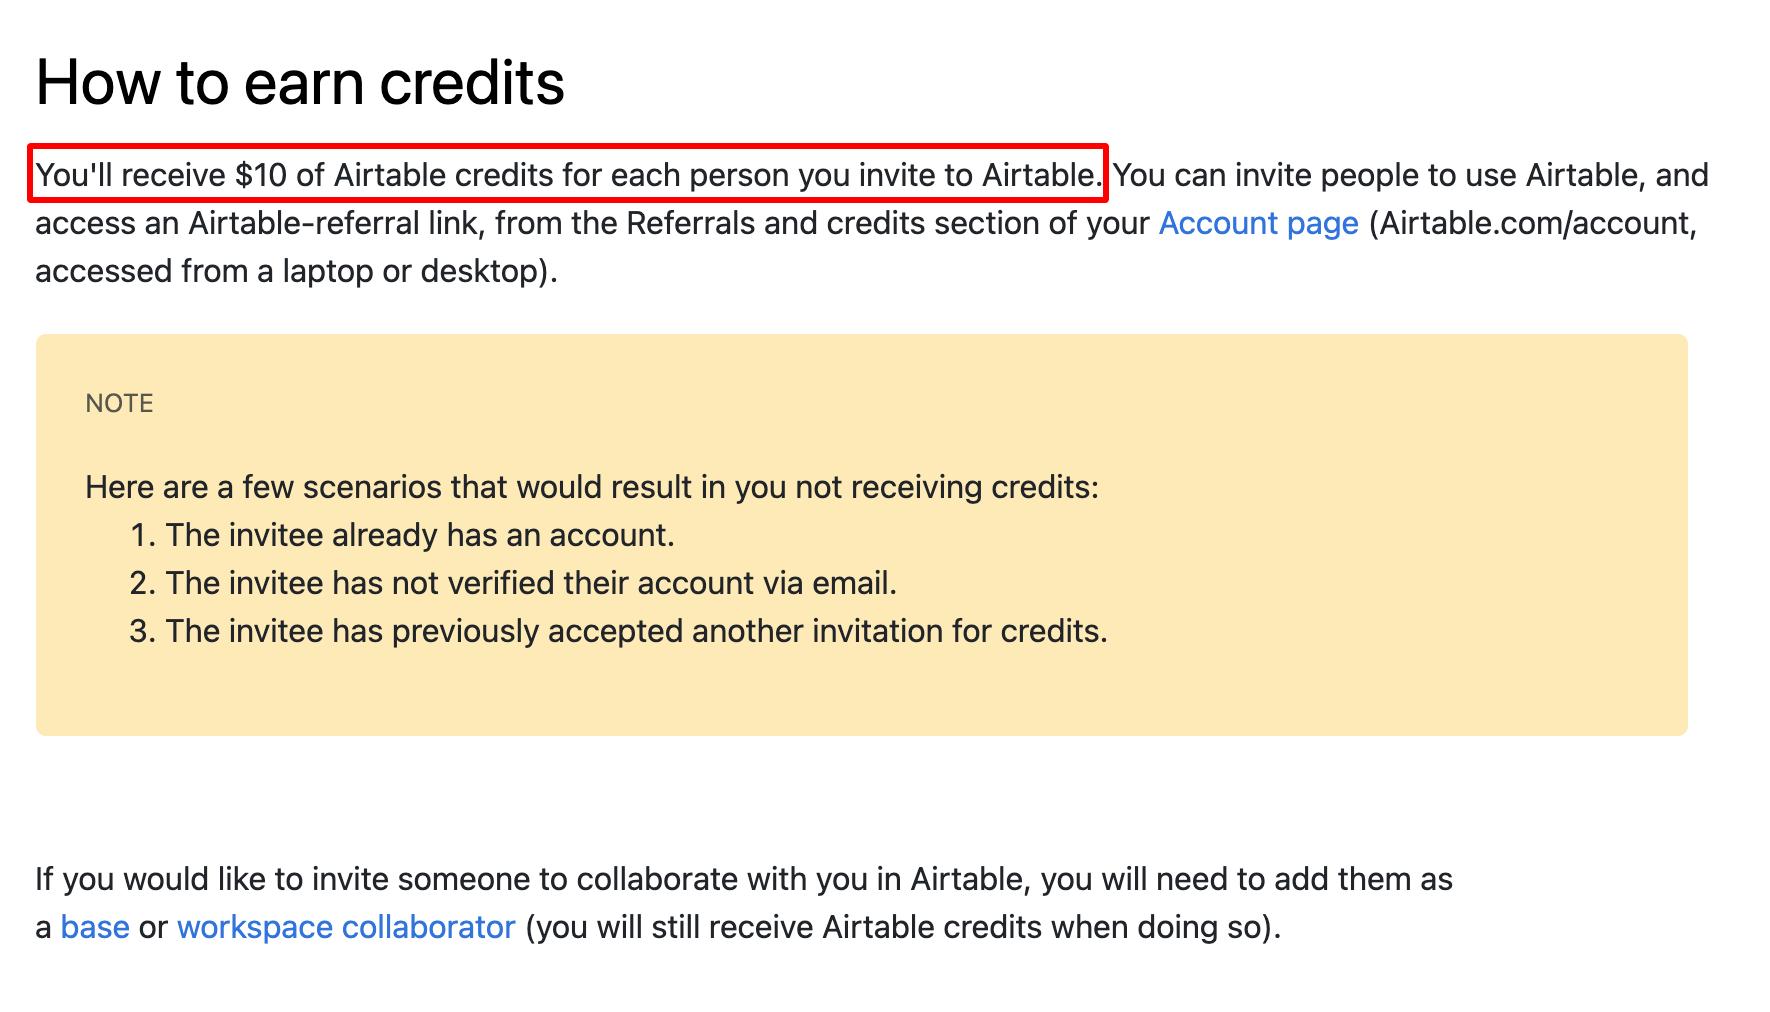 Airtable referral rewards